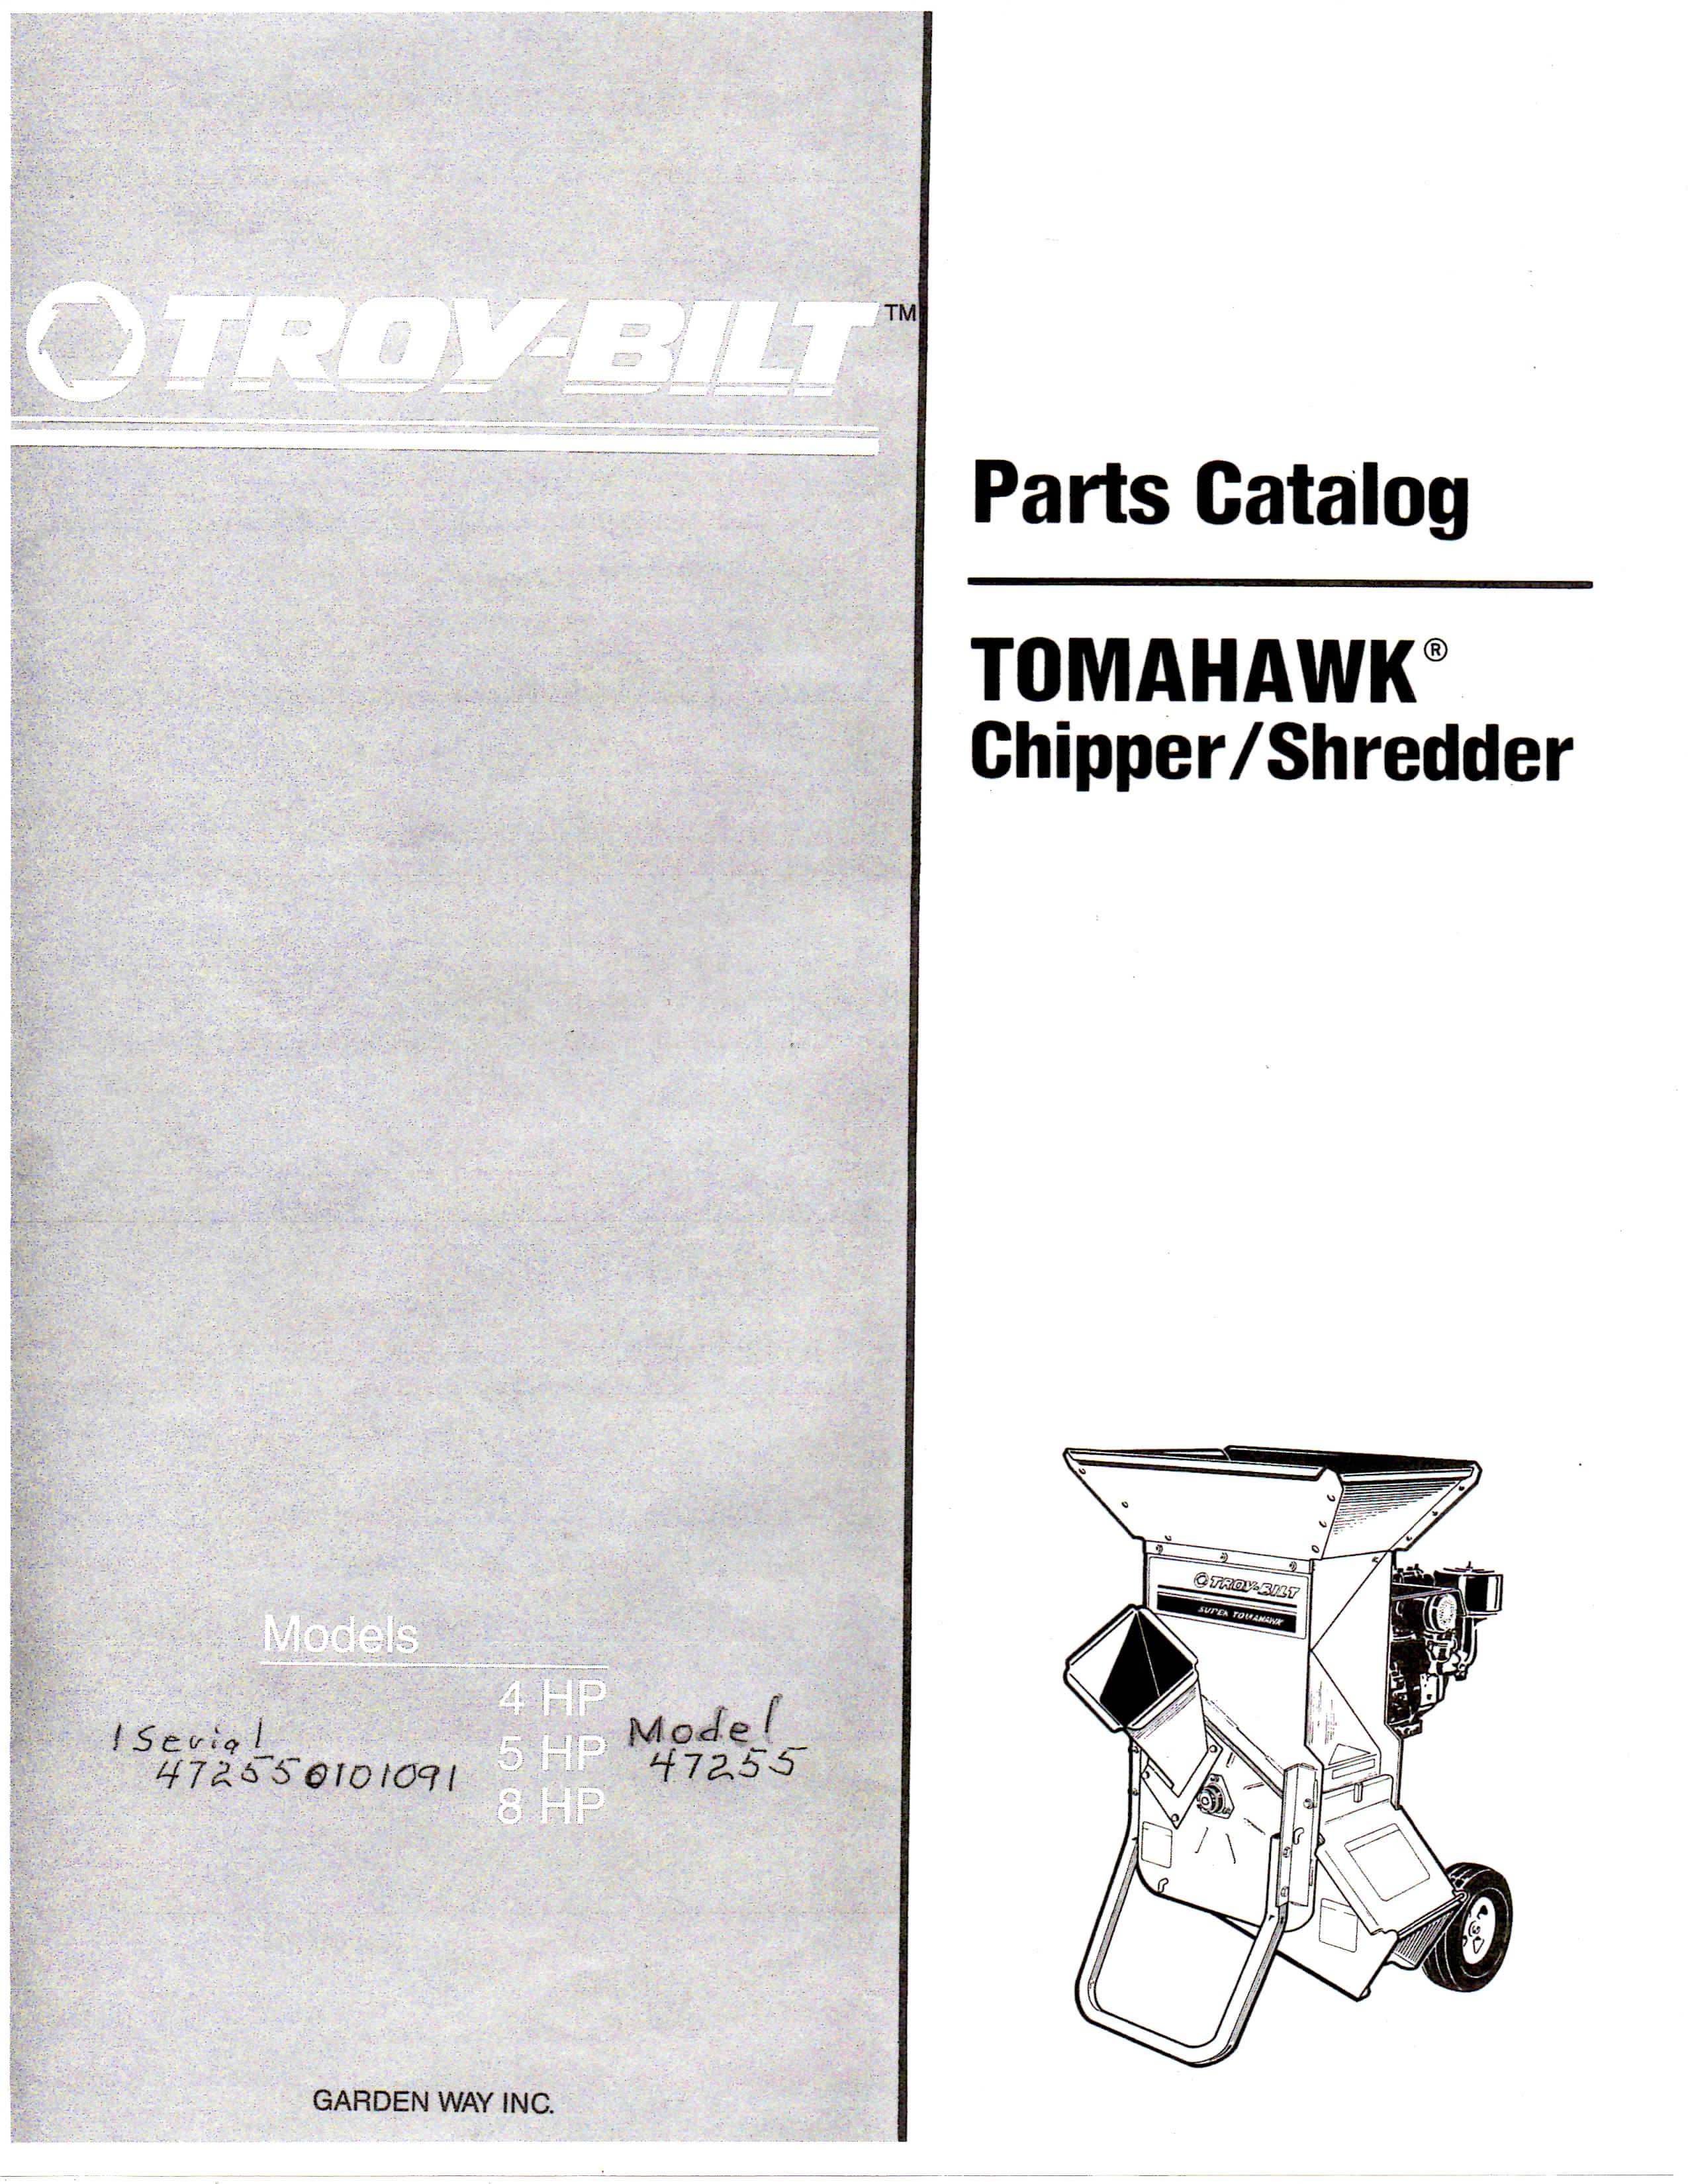 1992 Troy Bilt 4hp 5hp 8hp Models Parts Catalog Tomahawk Chipper Shredder 10 Page